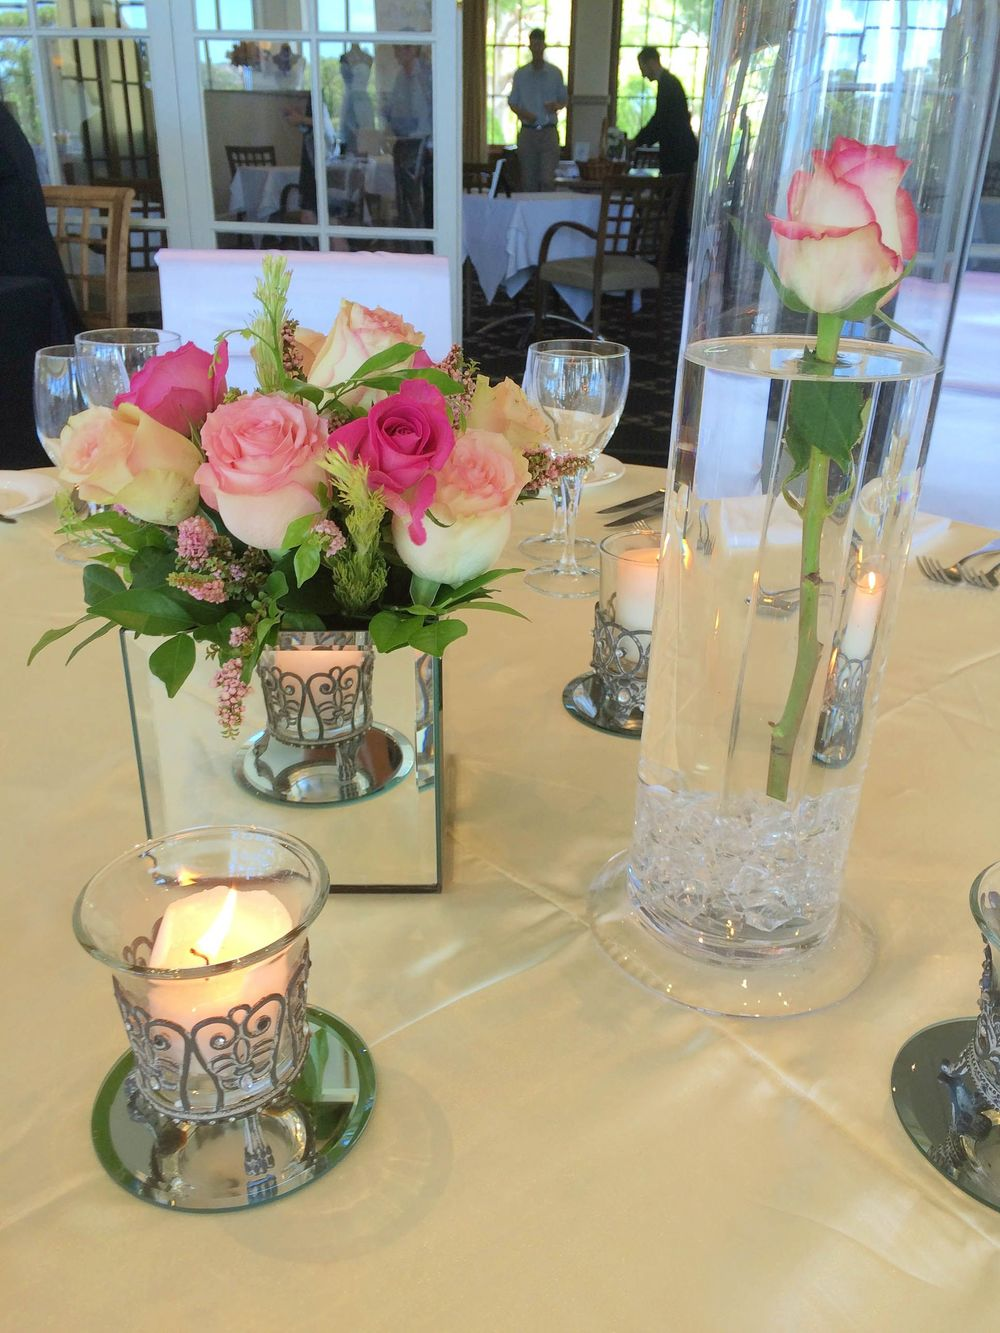 the-wedding-decorator-sydney-bridal-table-flowers-image.jpg